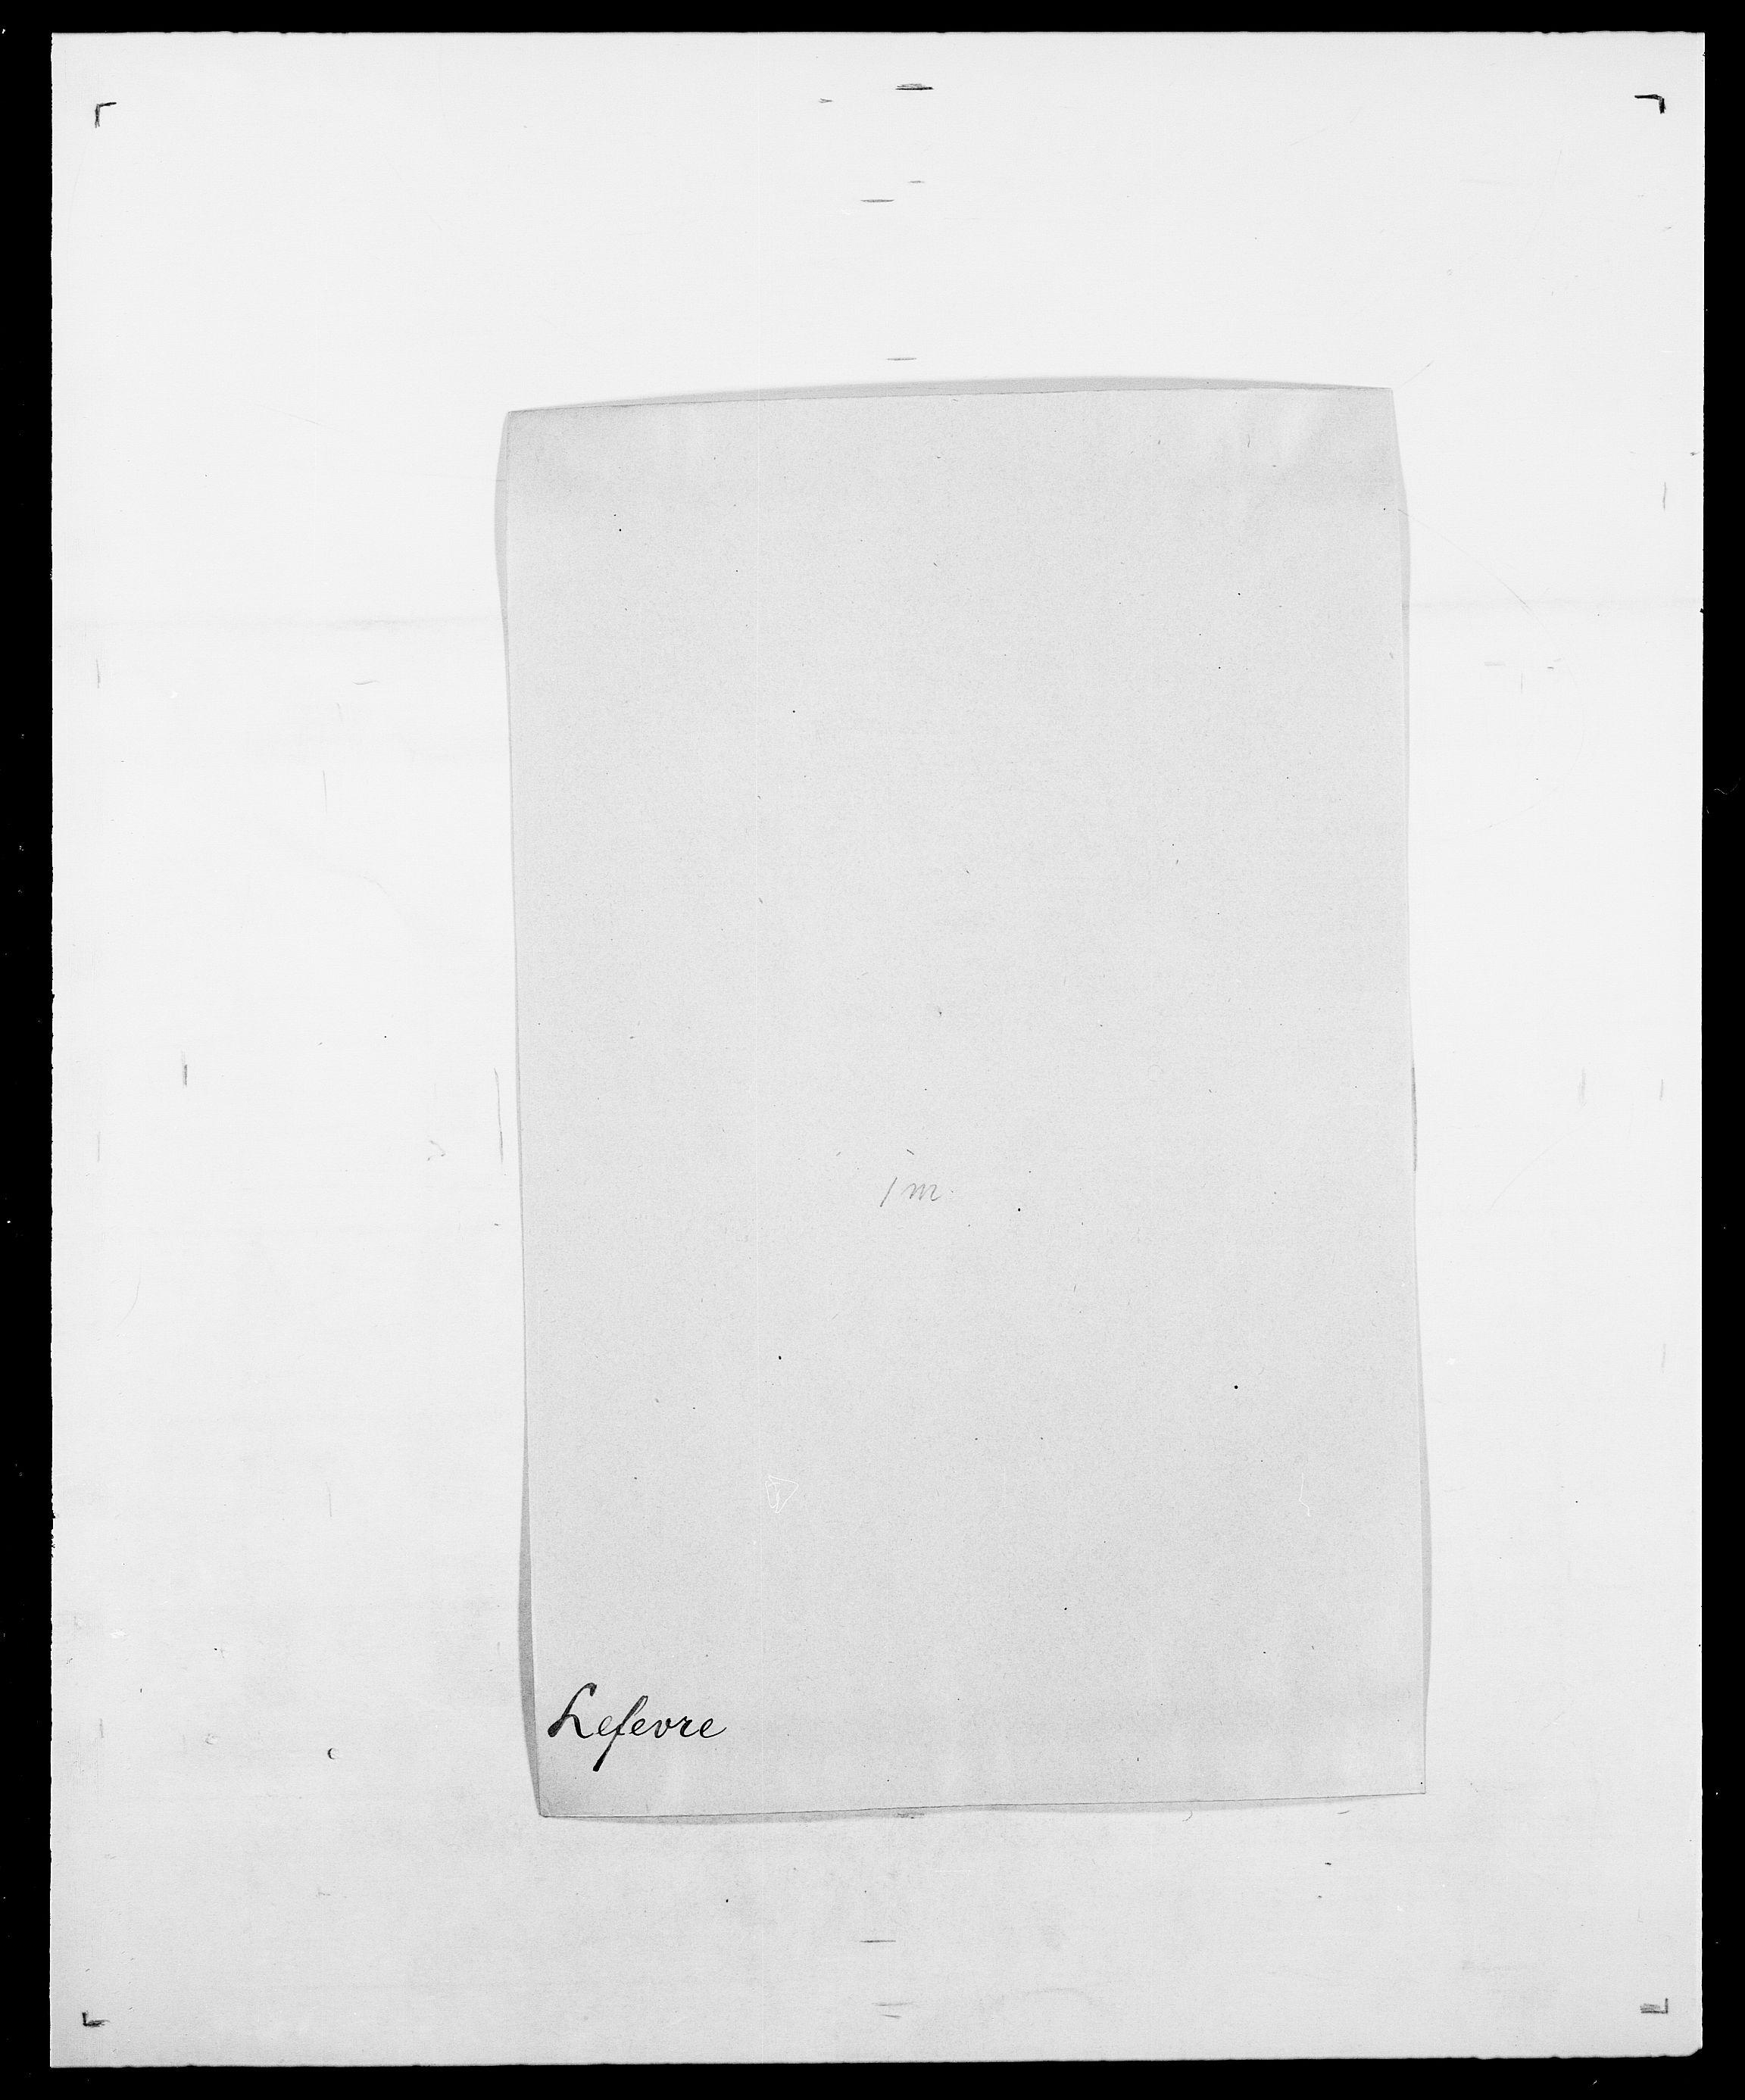 SAO, Delgobe, Charles Antoine - samling, D/Da/L0023: Lau - Lirvyn, s. 83